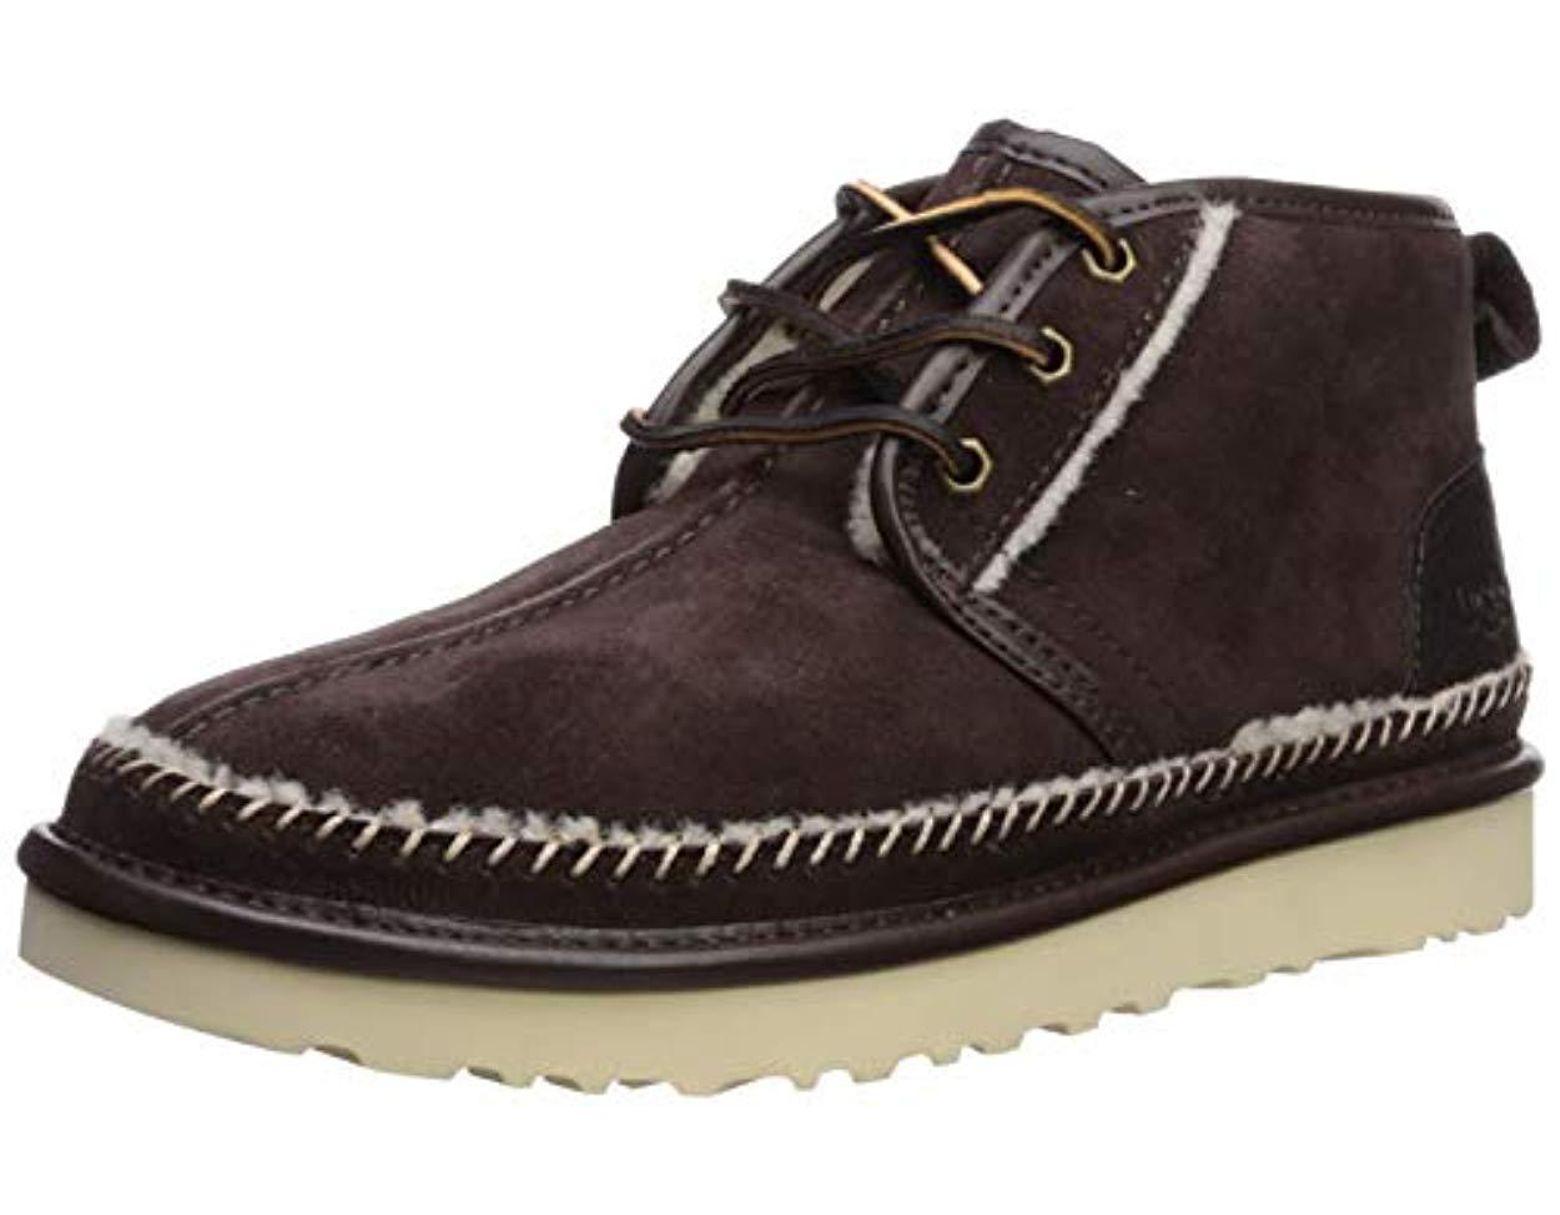 4a6cde0ab8b Men's Brown Neumel Stitch Chukka Boot